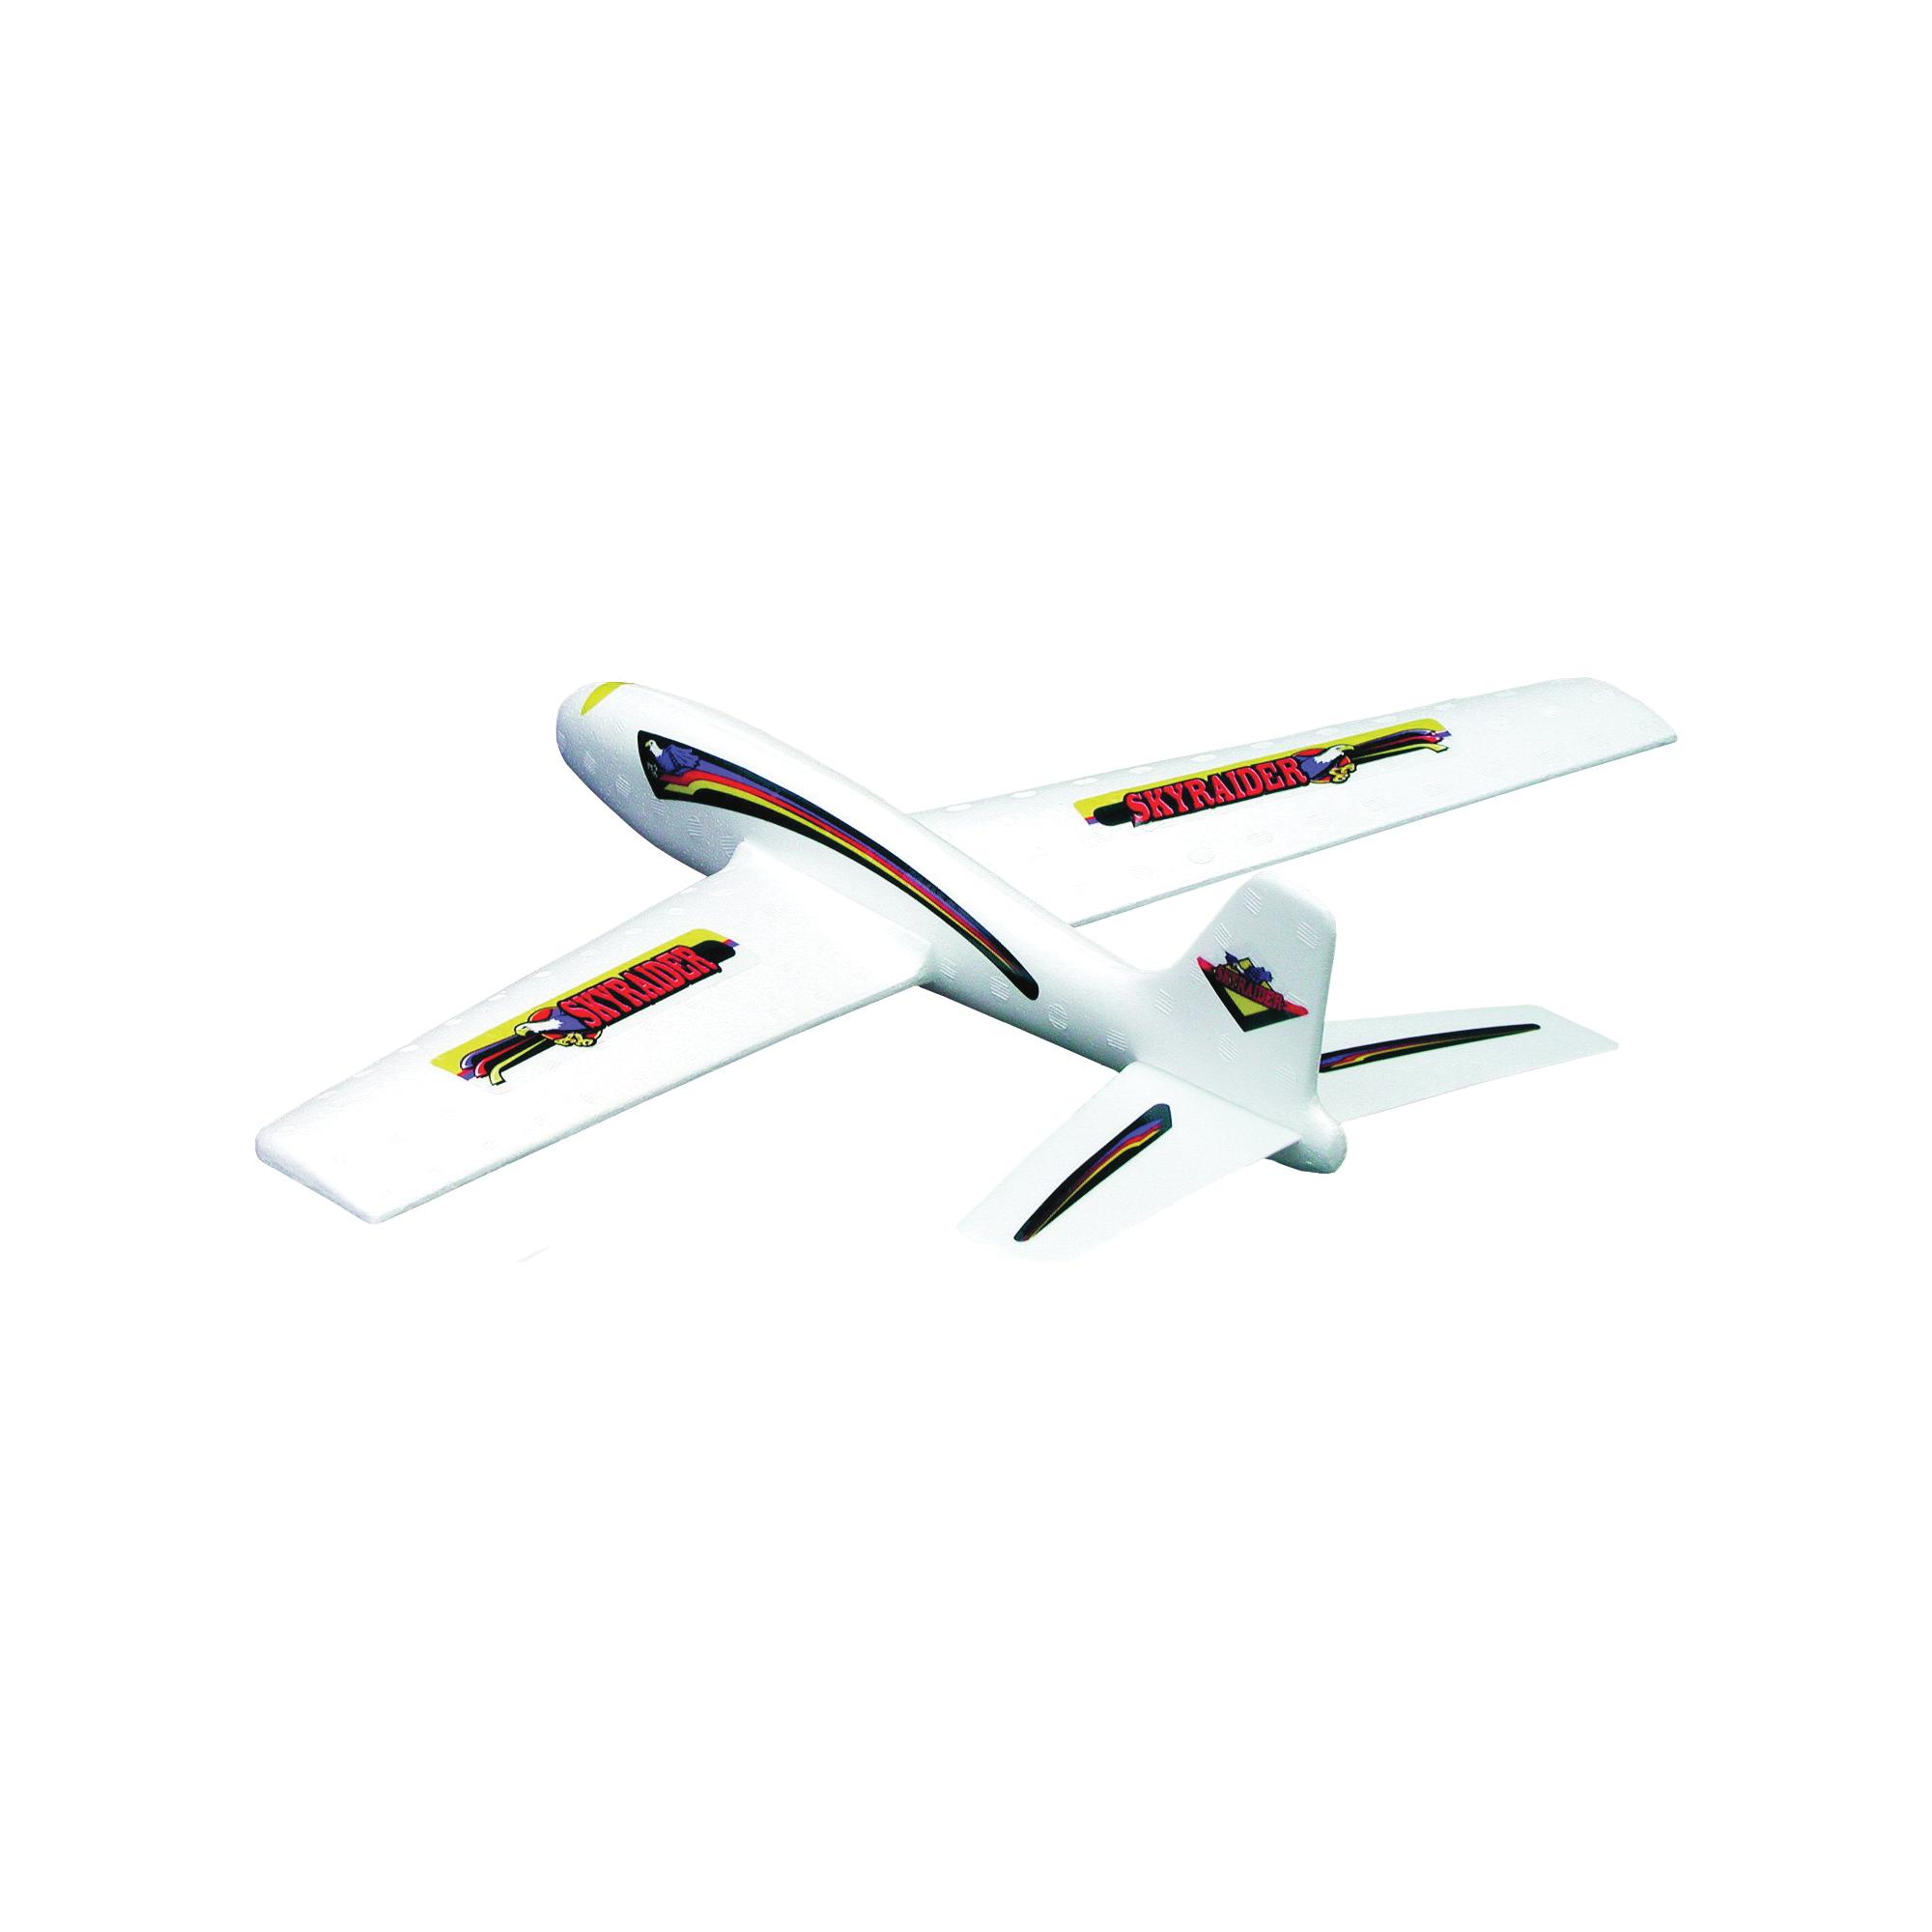 Picture of Guillow's Sky Raider 2645 Foam Glider Plane, 24 in, Foam